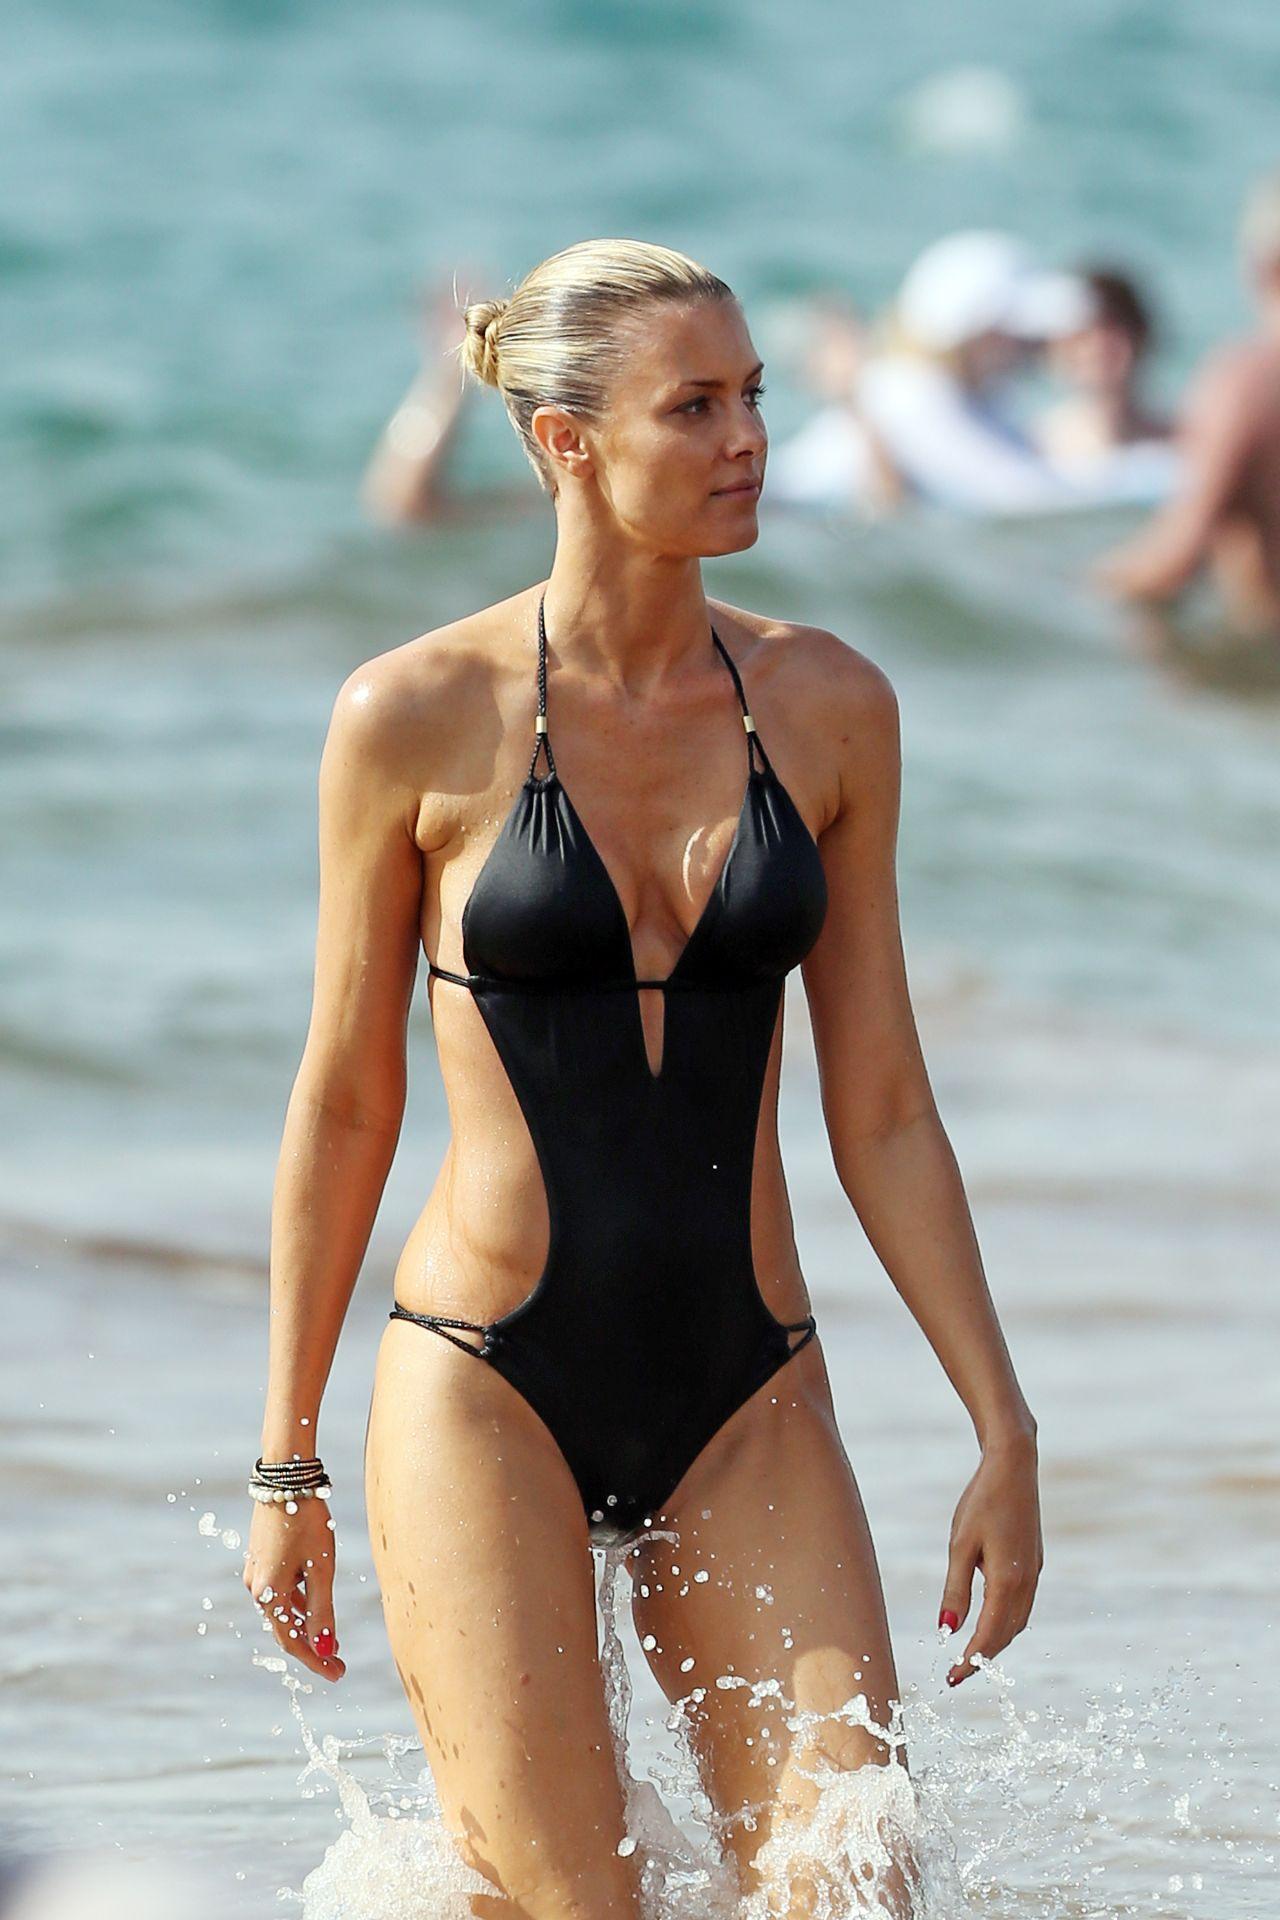 Leaked Paige Butcher nude (73 photos), Tits, Bikini, Feet, cameltoe 2006